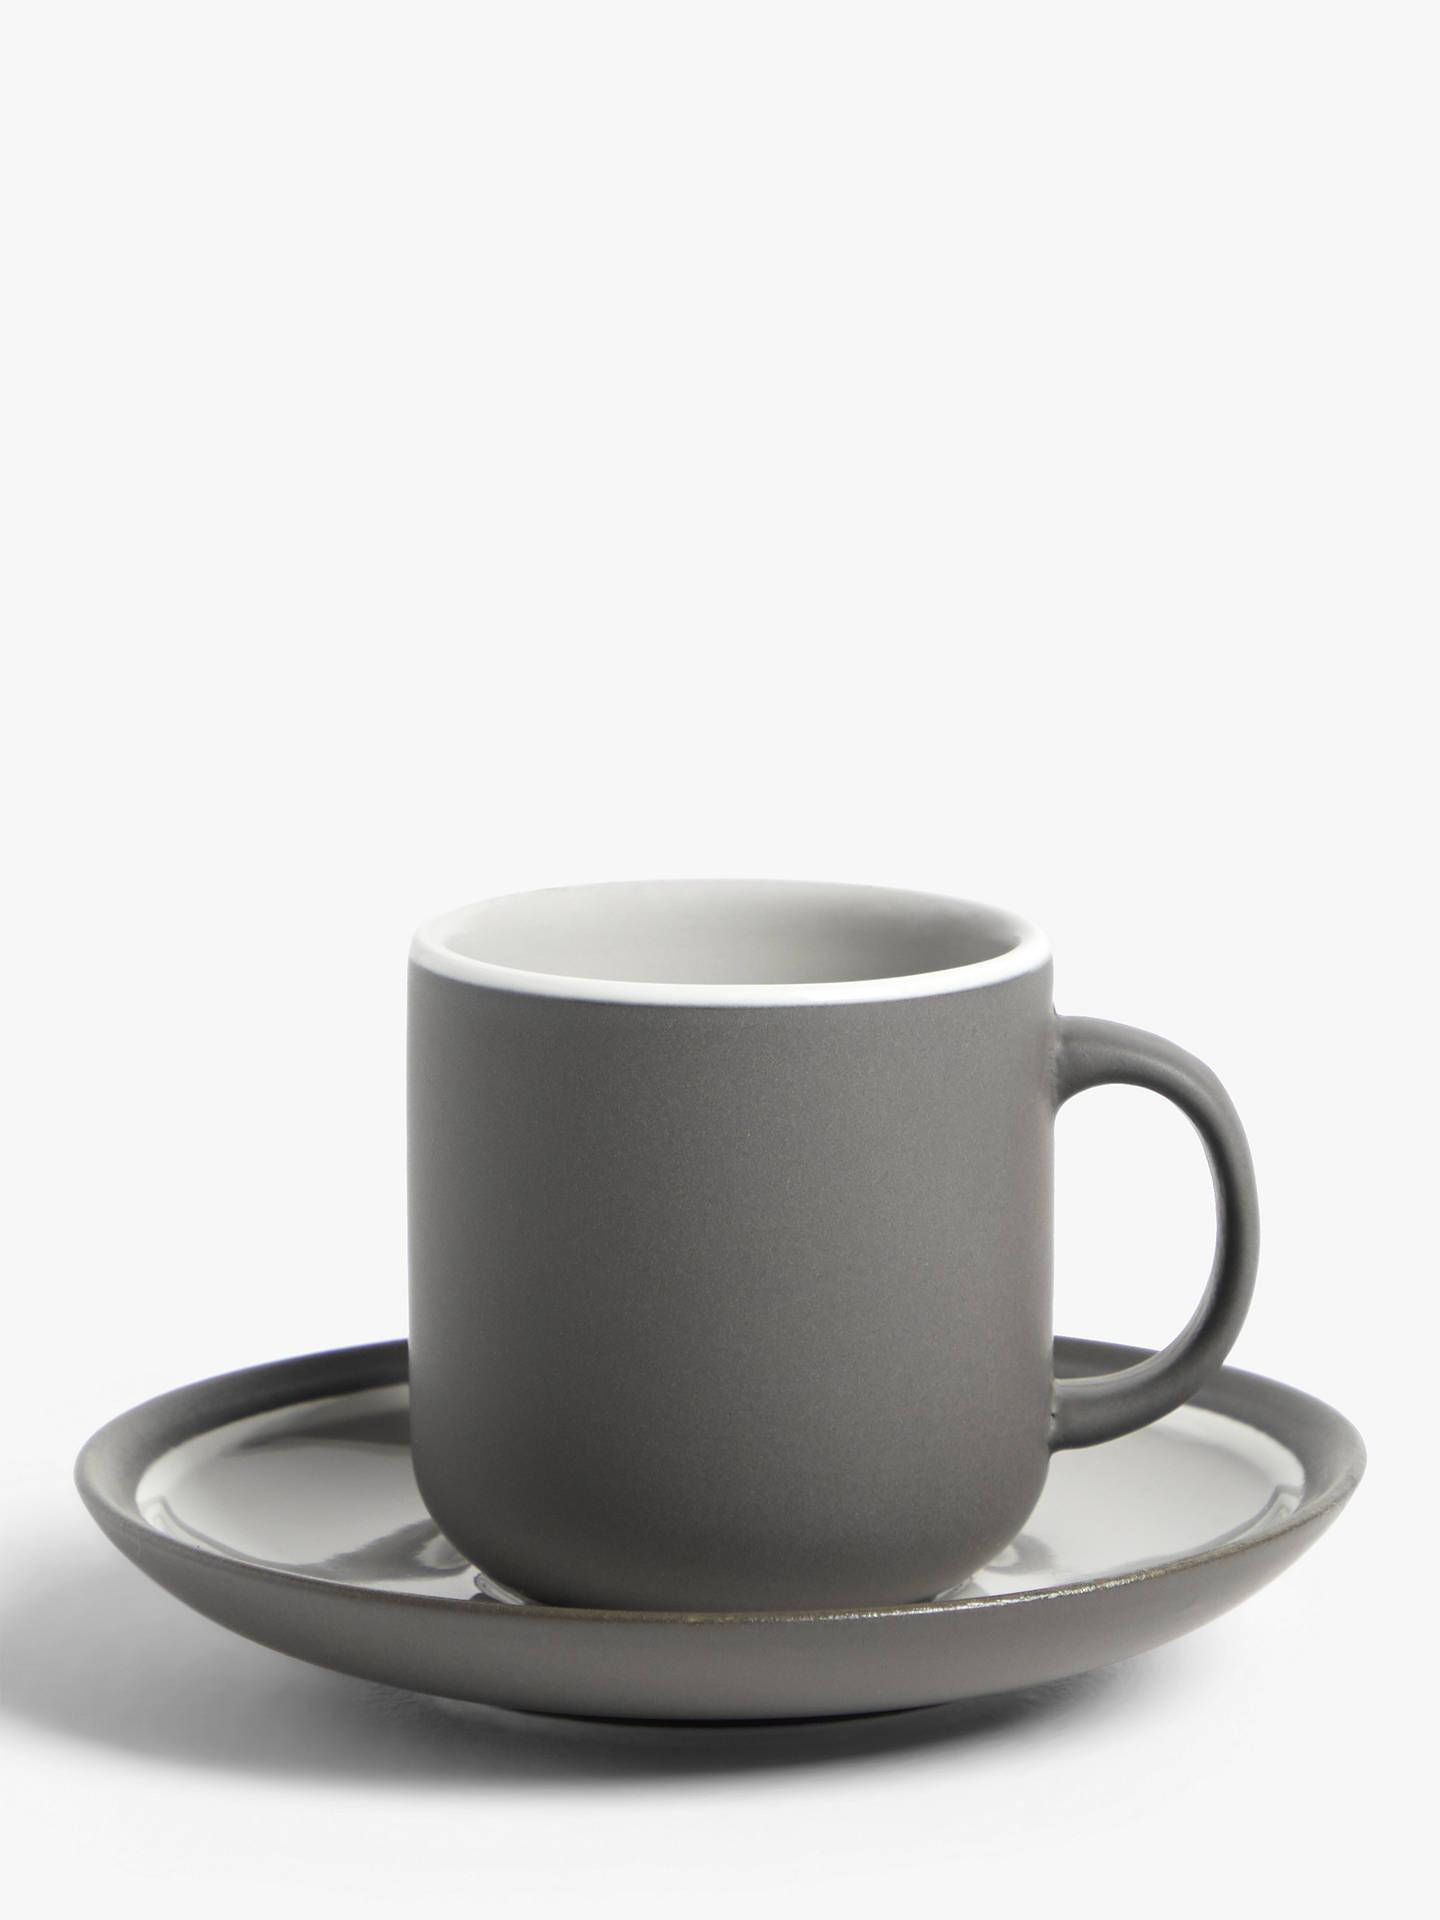 John Lewis & Partners Puritan Espresso Cup & Saucer, Set of 2, 90ml, Dark Grey